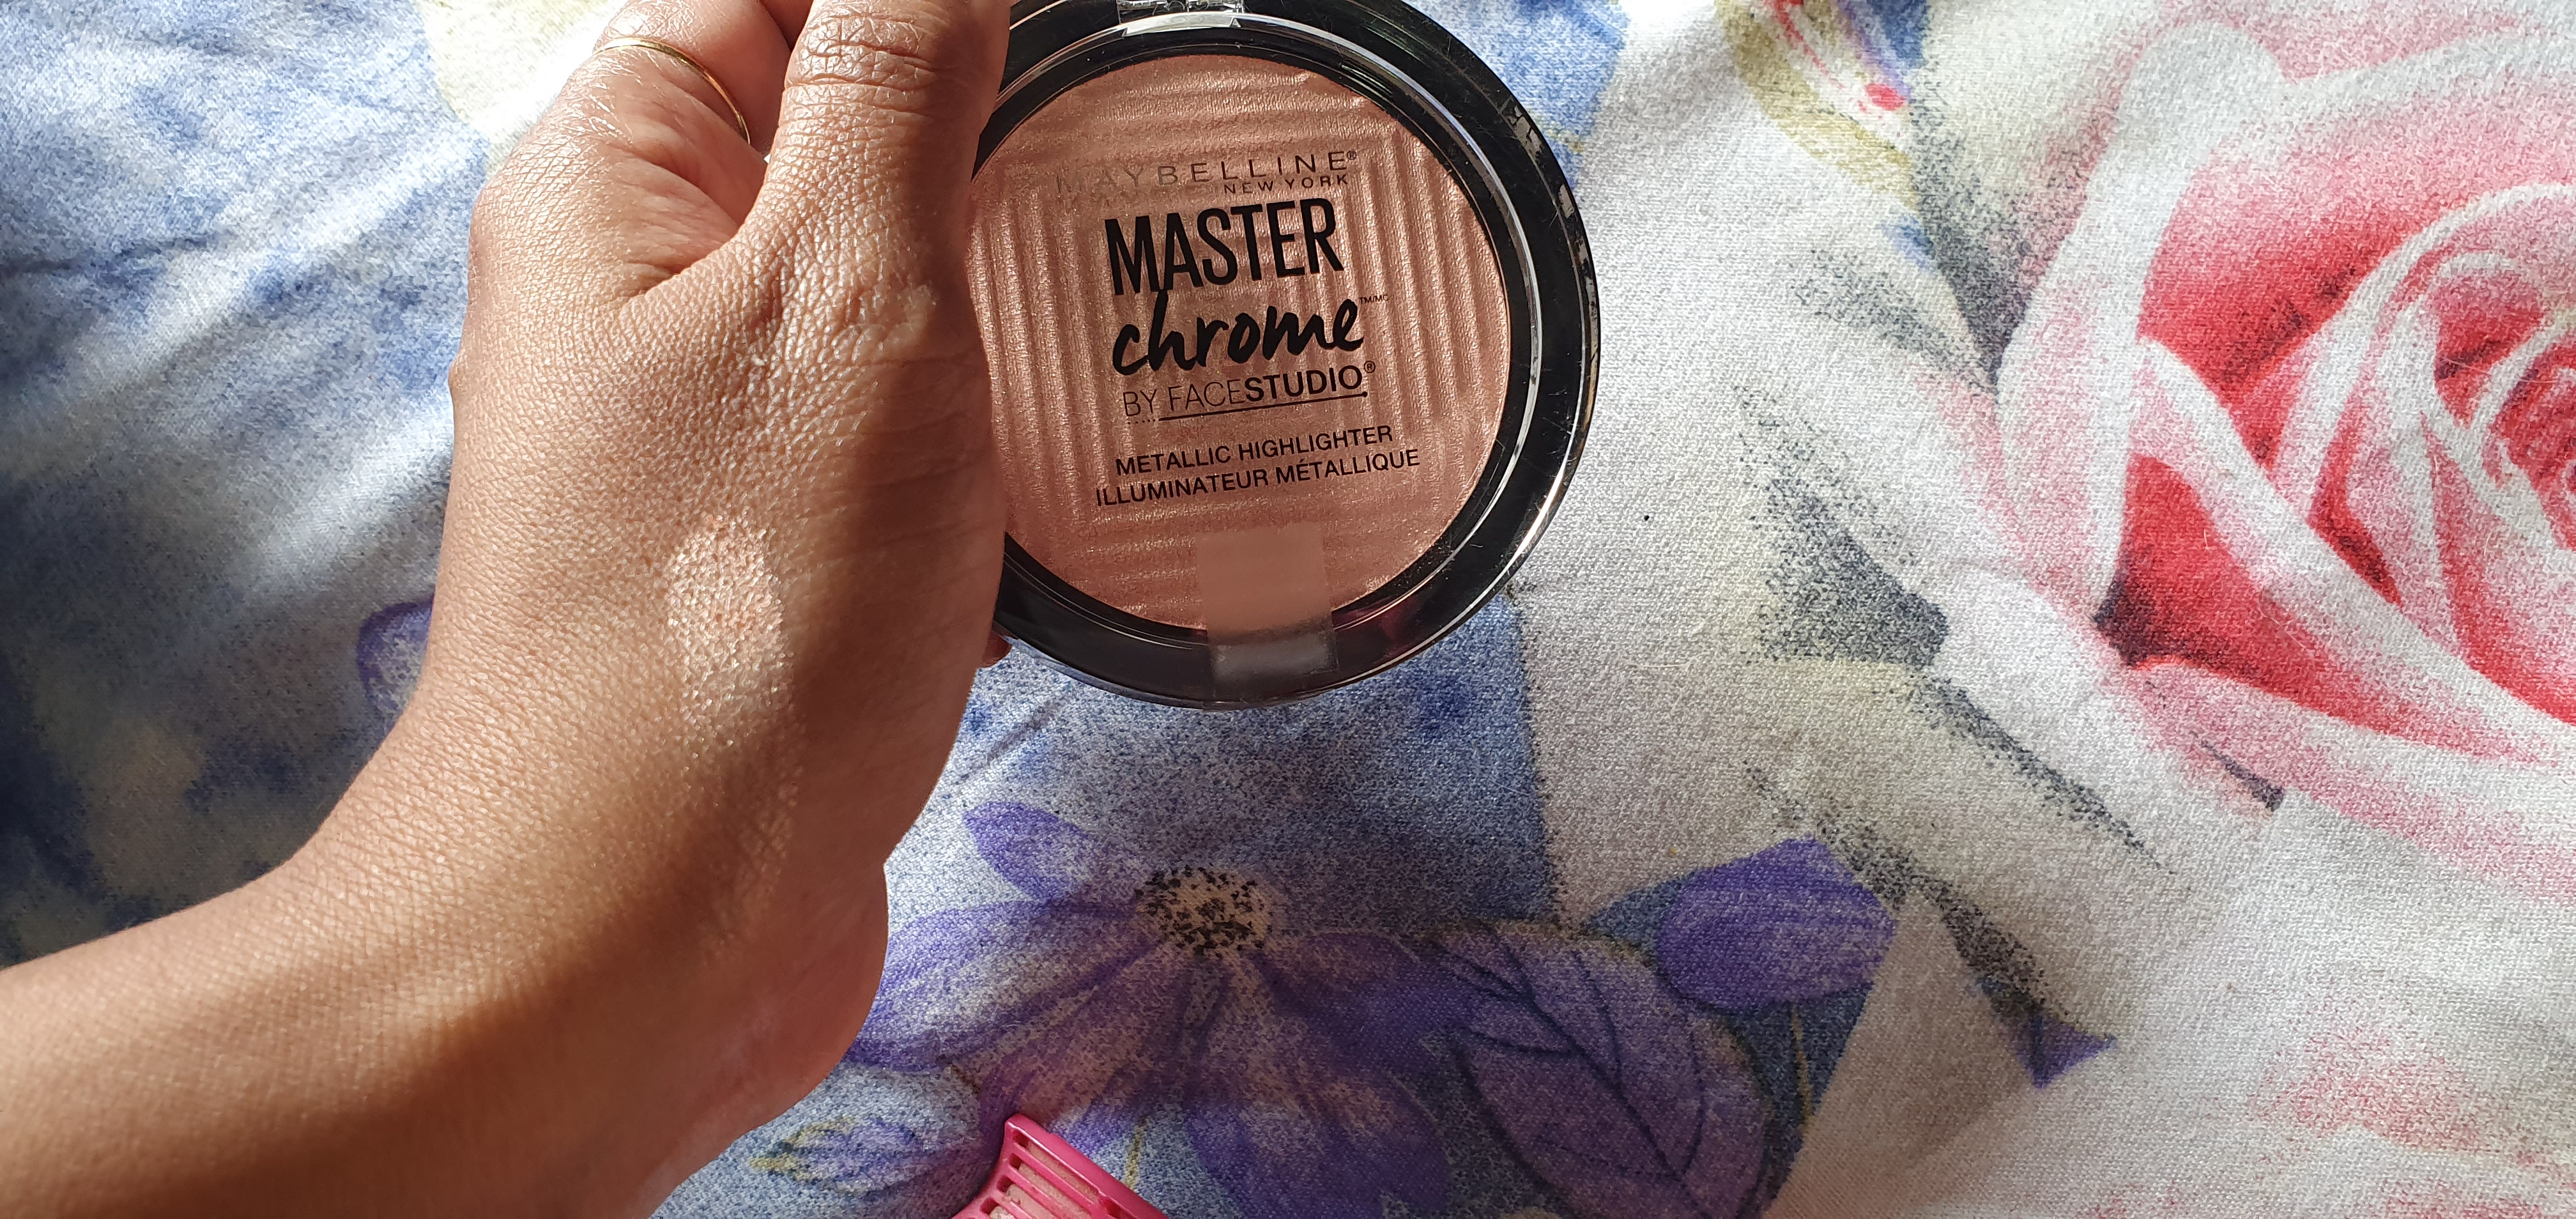 Maybelline Facestudio Master Chrome Metallic Highlighter-Best Highliter-By pamsstation